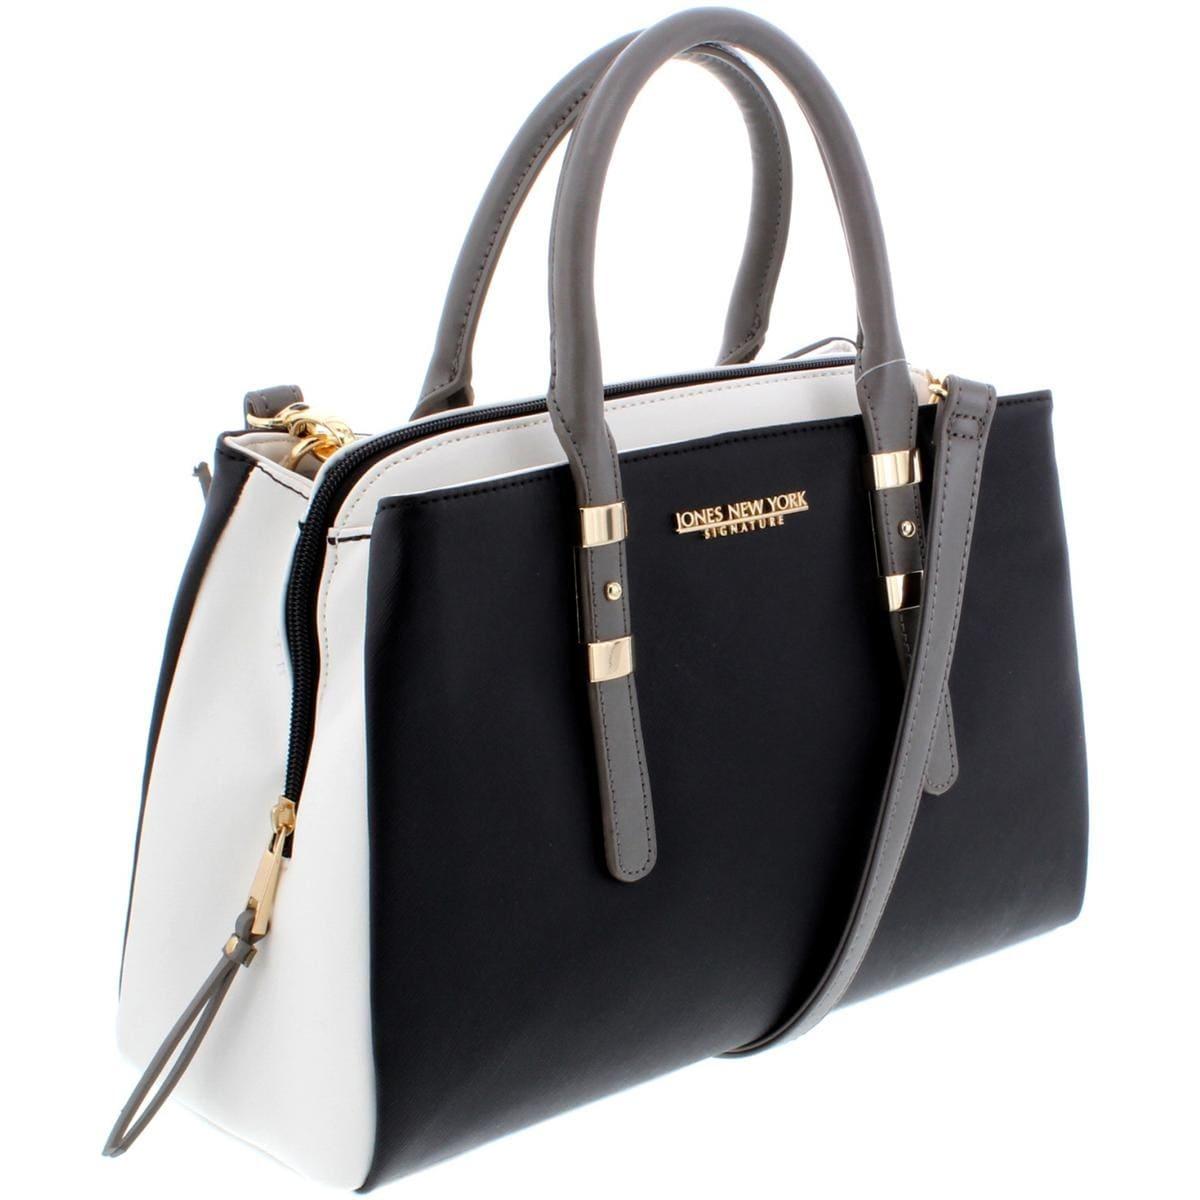 6a8922986b8 Shop Jones New York Womens Zara Satchel Handbag Faux Leather Logo - Medium  - Free Shipping On Orders Over $45 - Overstock - 22109690